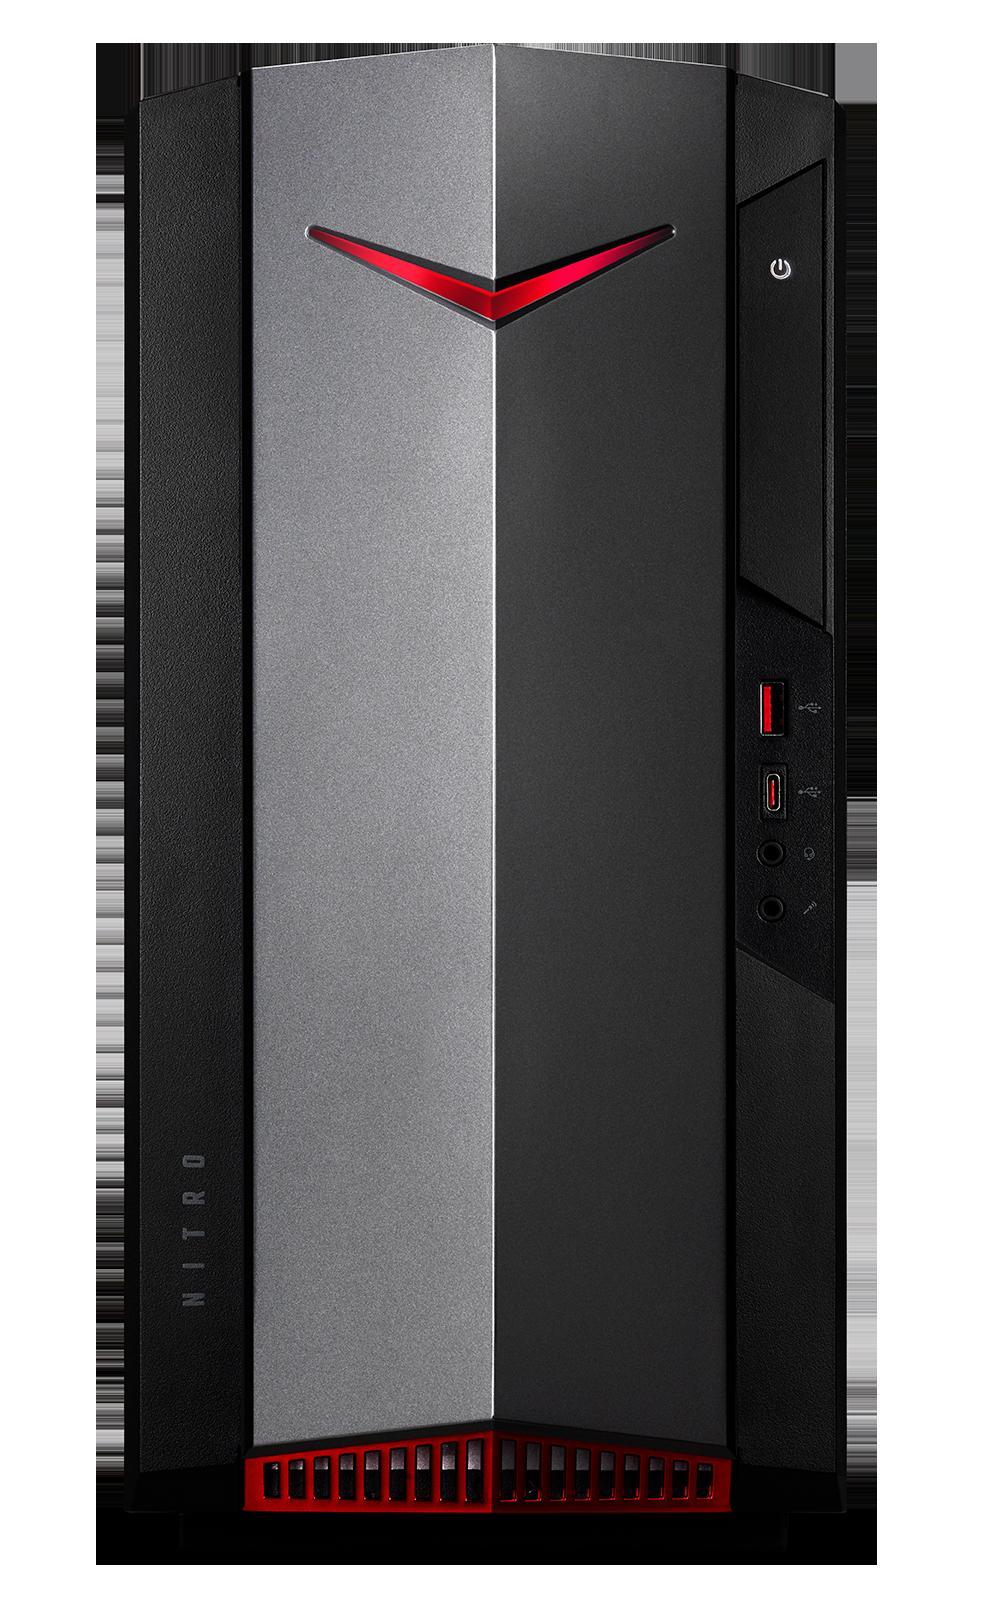 Acer Nitro N50-620 - i7-11700F/1TBSSD/16G/RTX3060Ti/W10 - DG.E2FEC.003